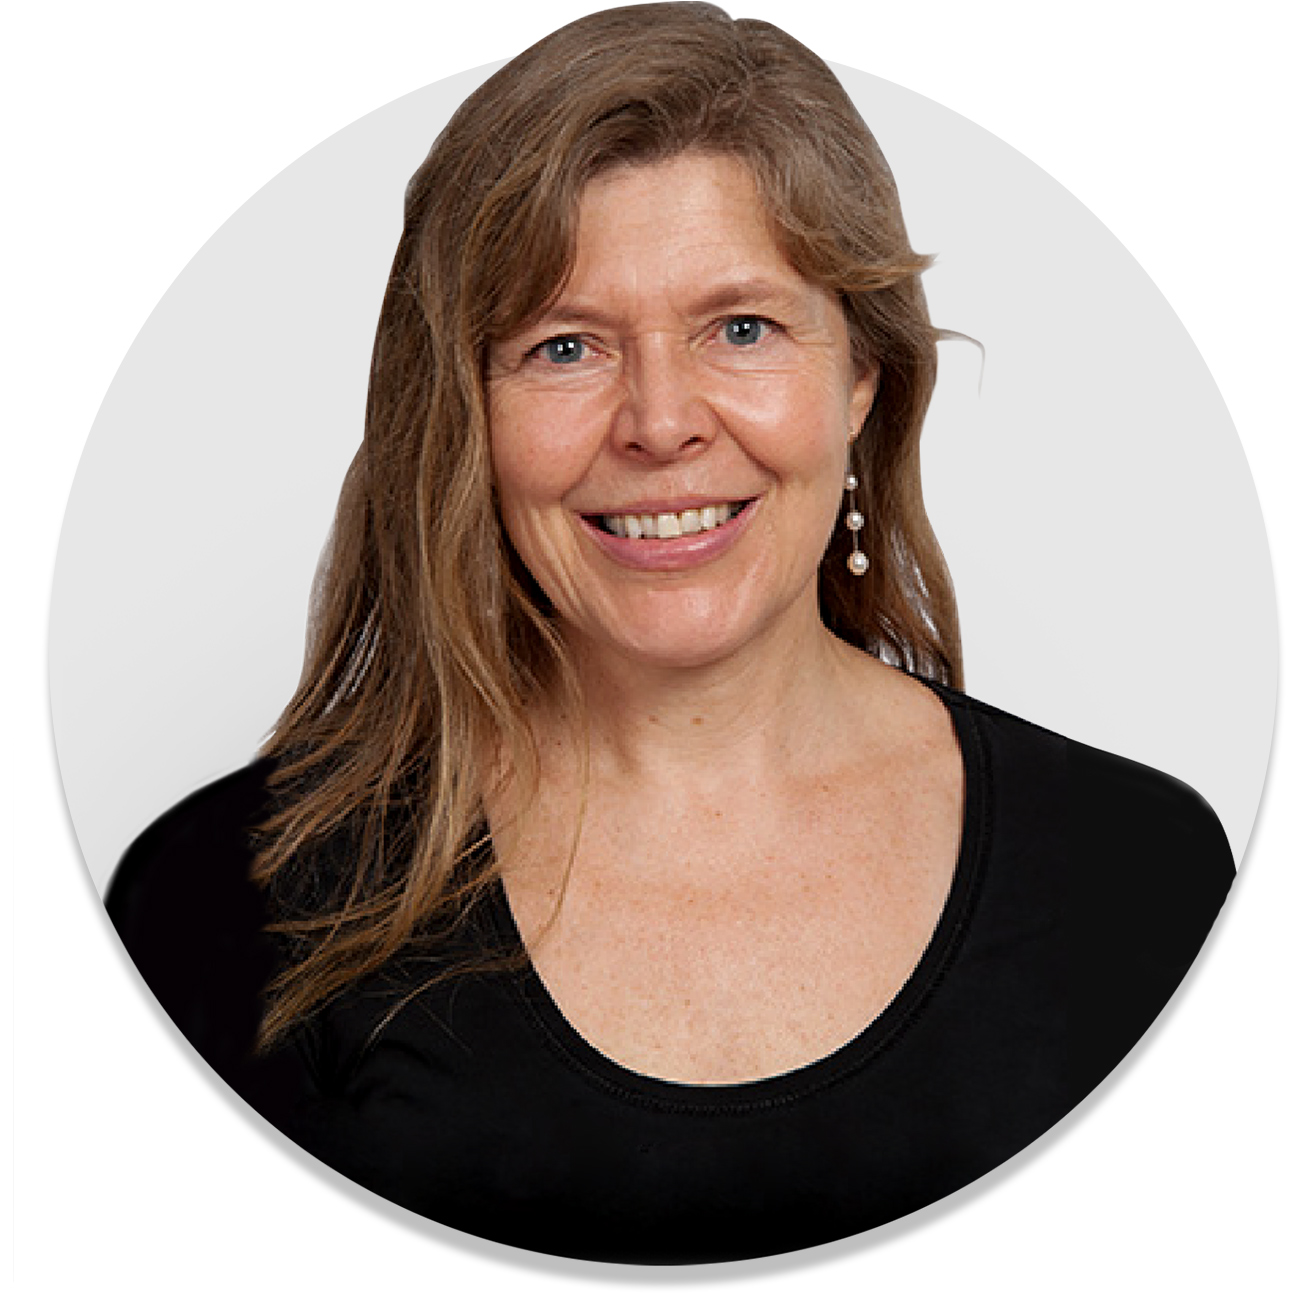 Hannele-Ruohola-Baker_Scientific-Advisor.jpg